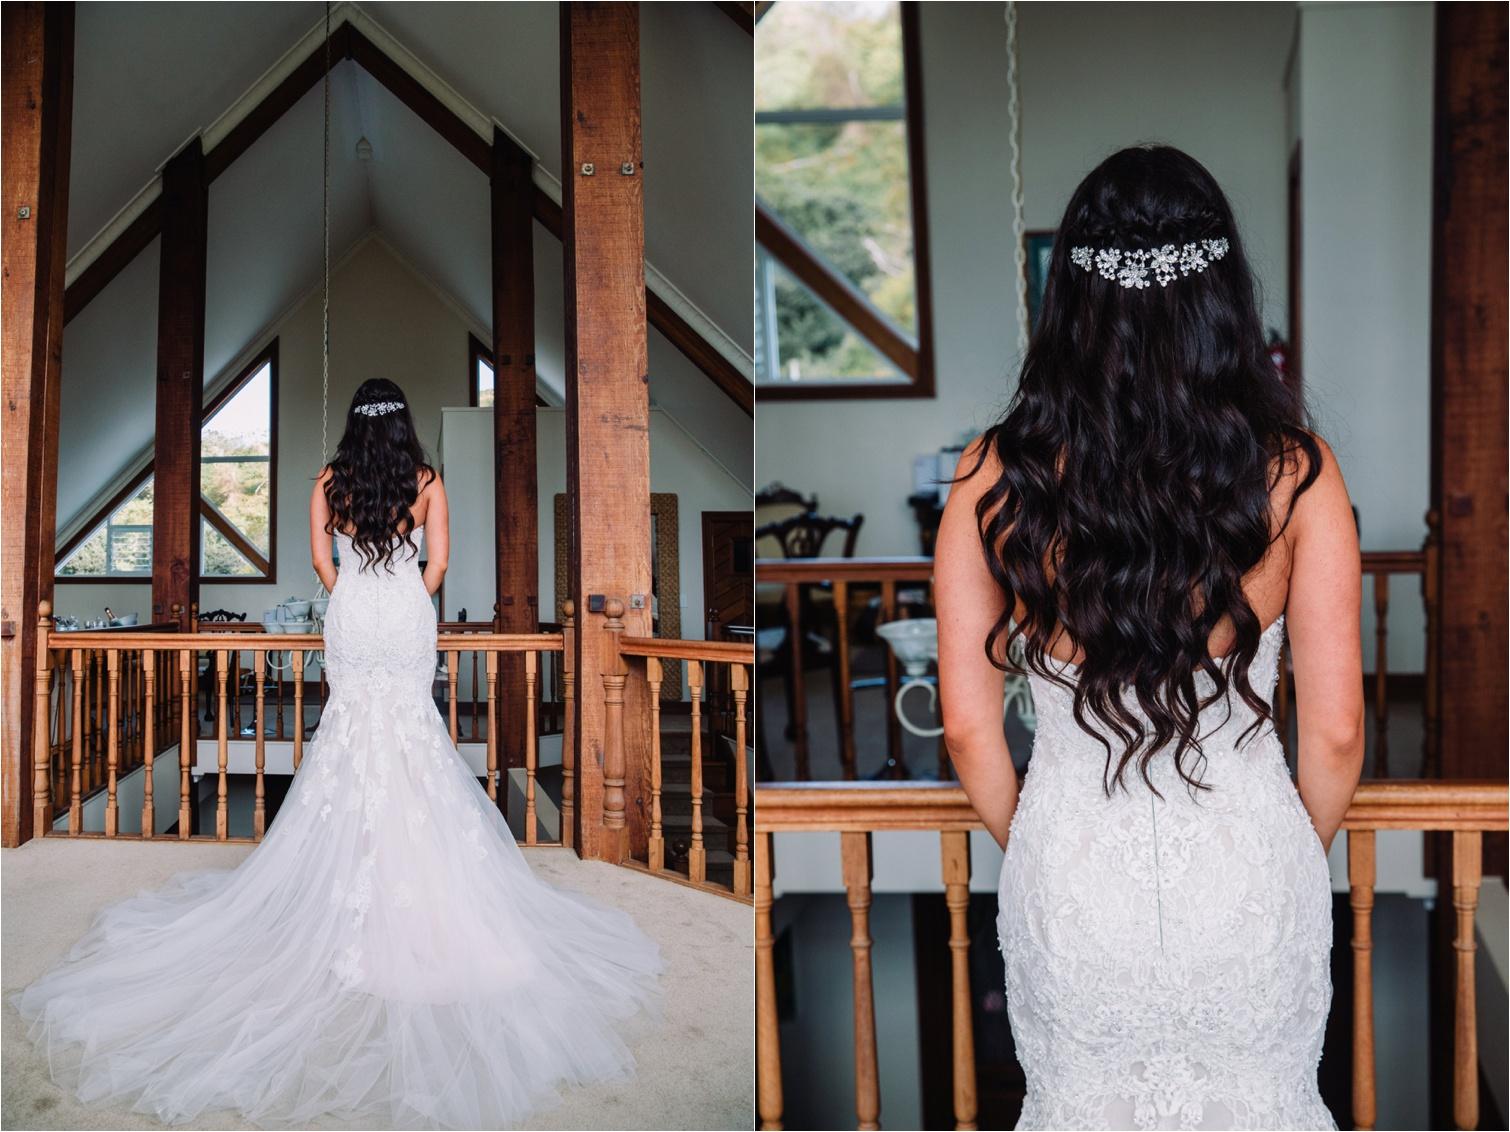 Maleny Manor Wedding Photography - Gold Coast Wedding Photographer_0017.jpg